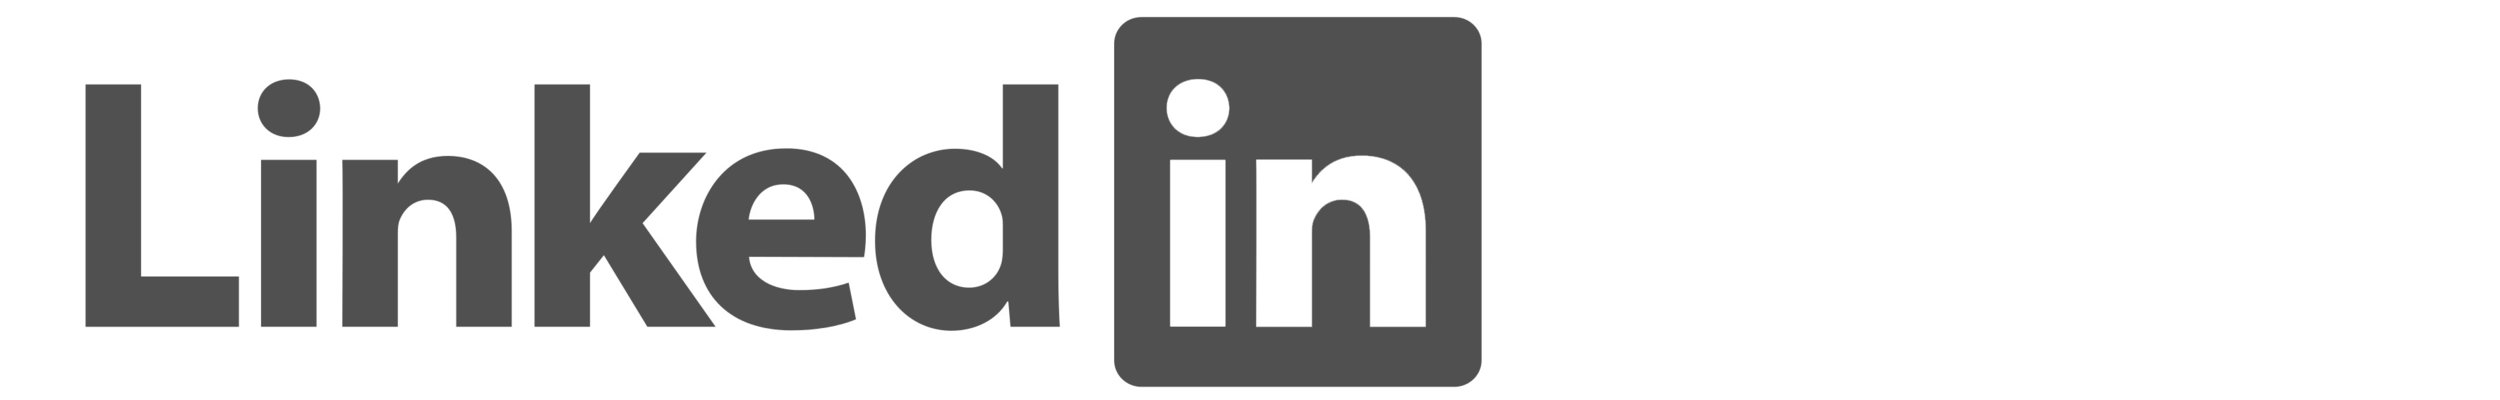 LinkedIn_Logo_gray.png